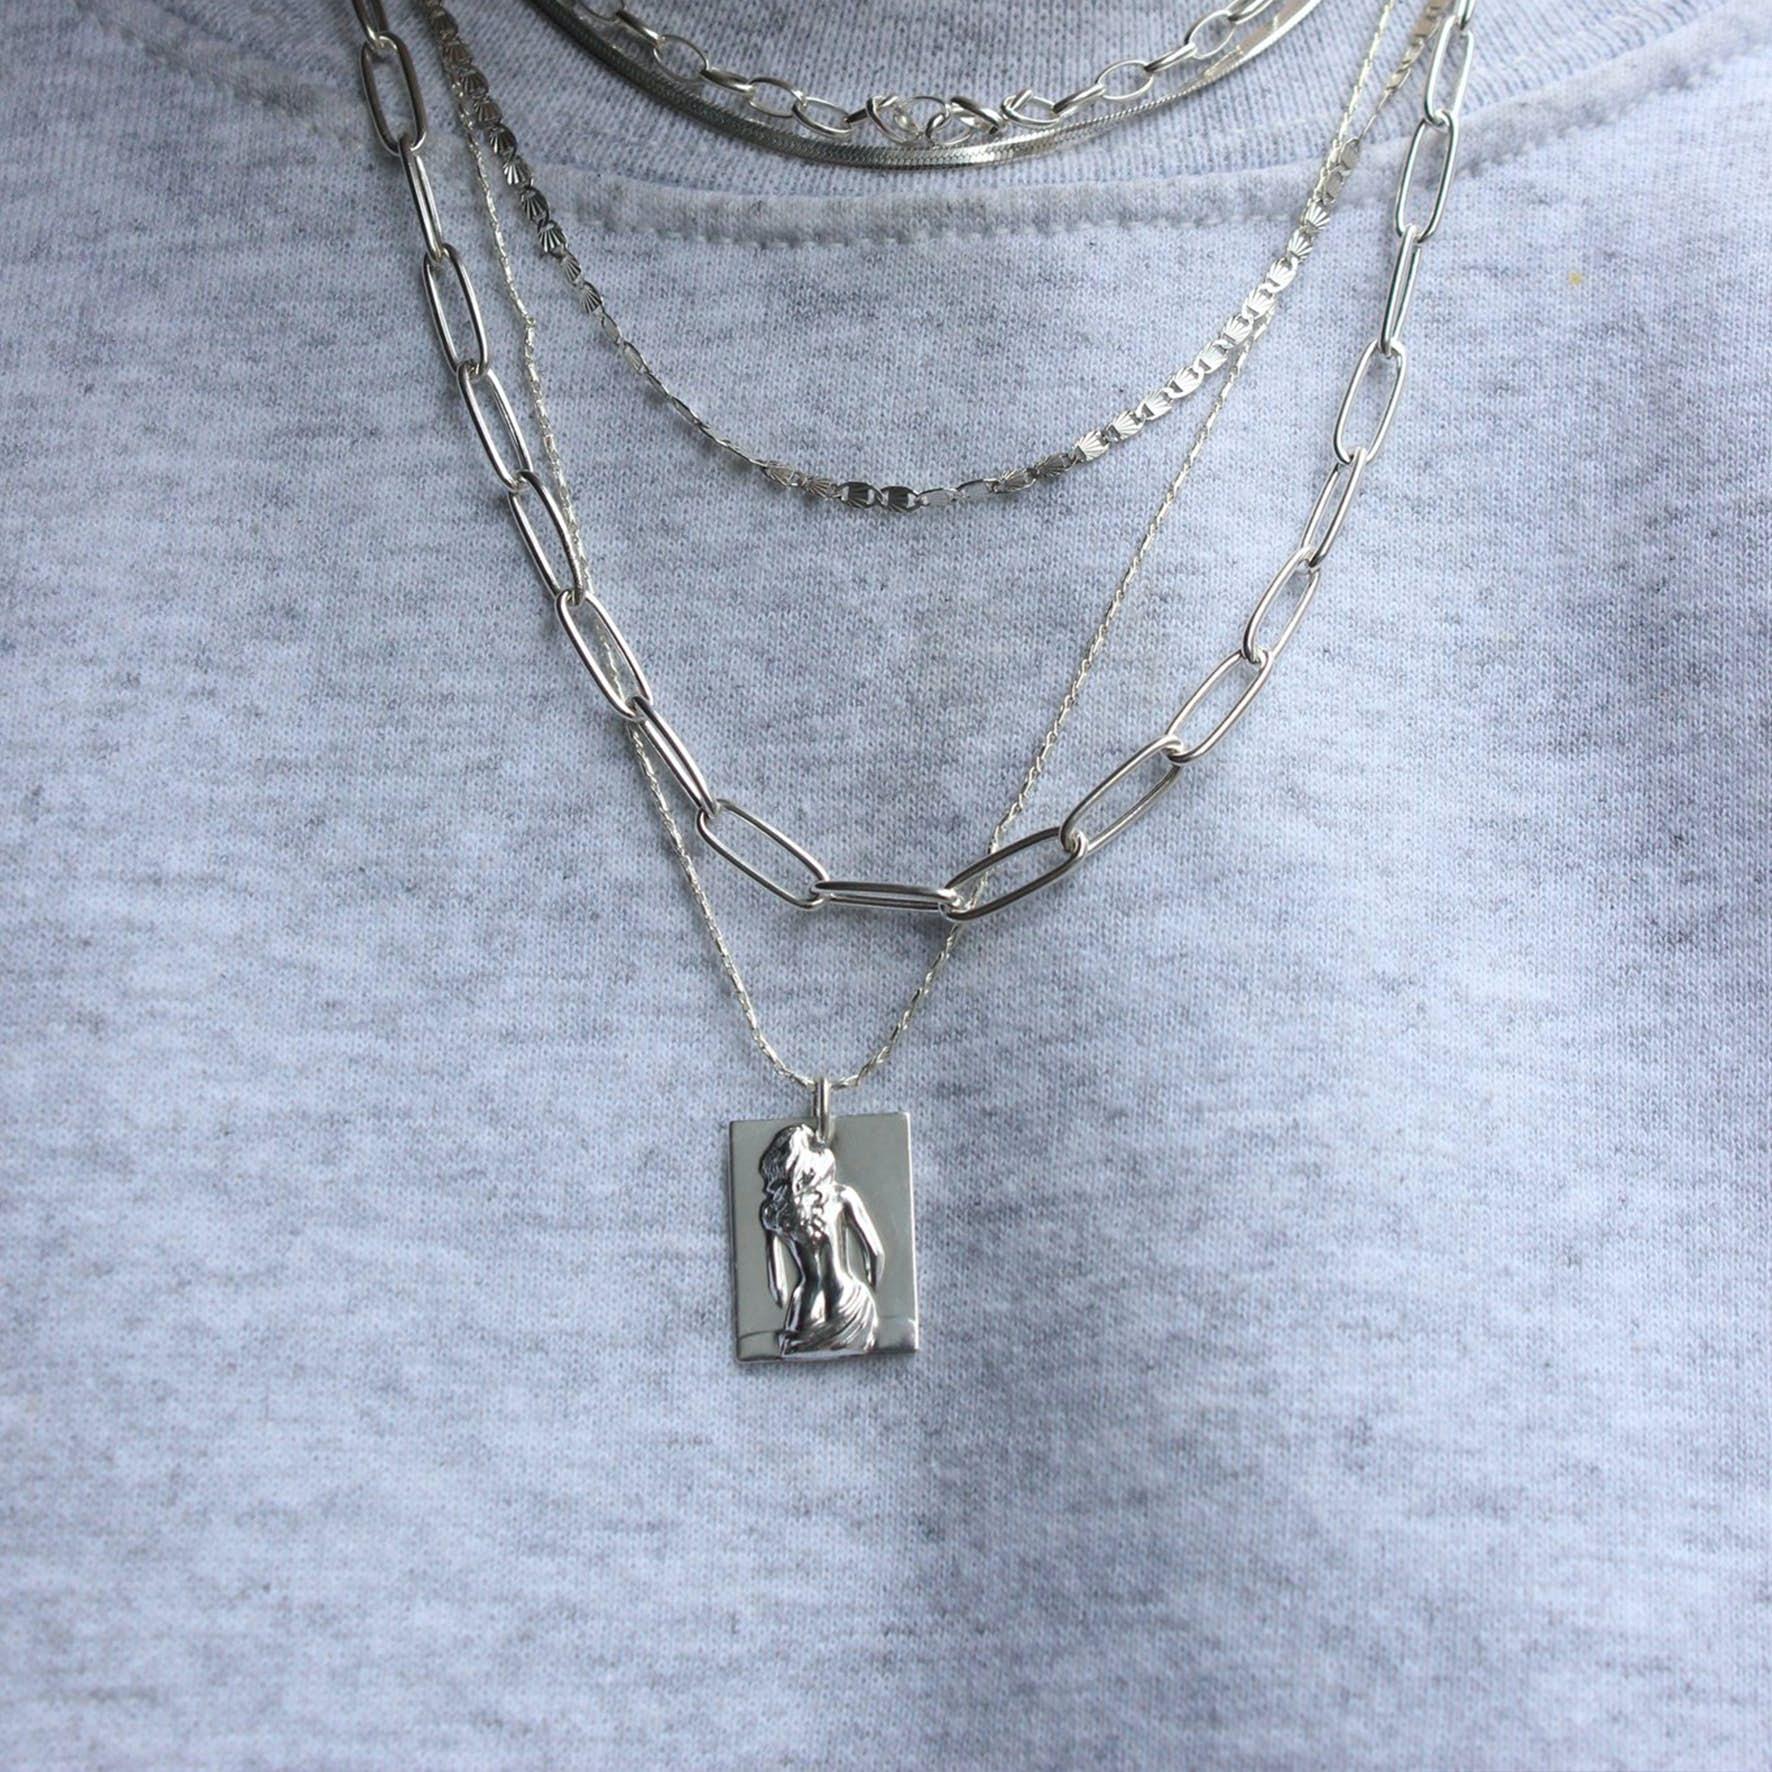 Lady Necklace fra Pico i Forgylt-Sølv Sterling 925